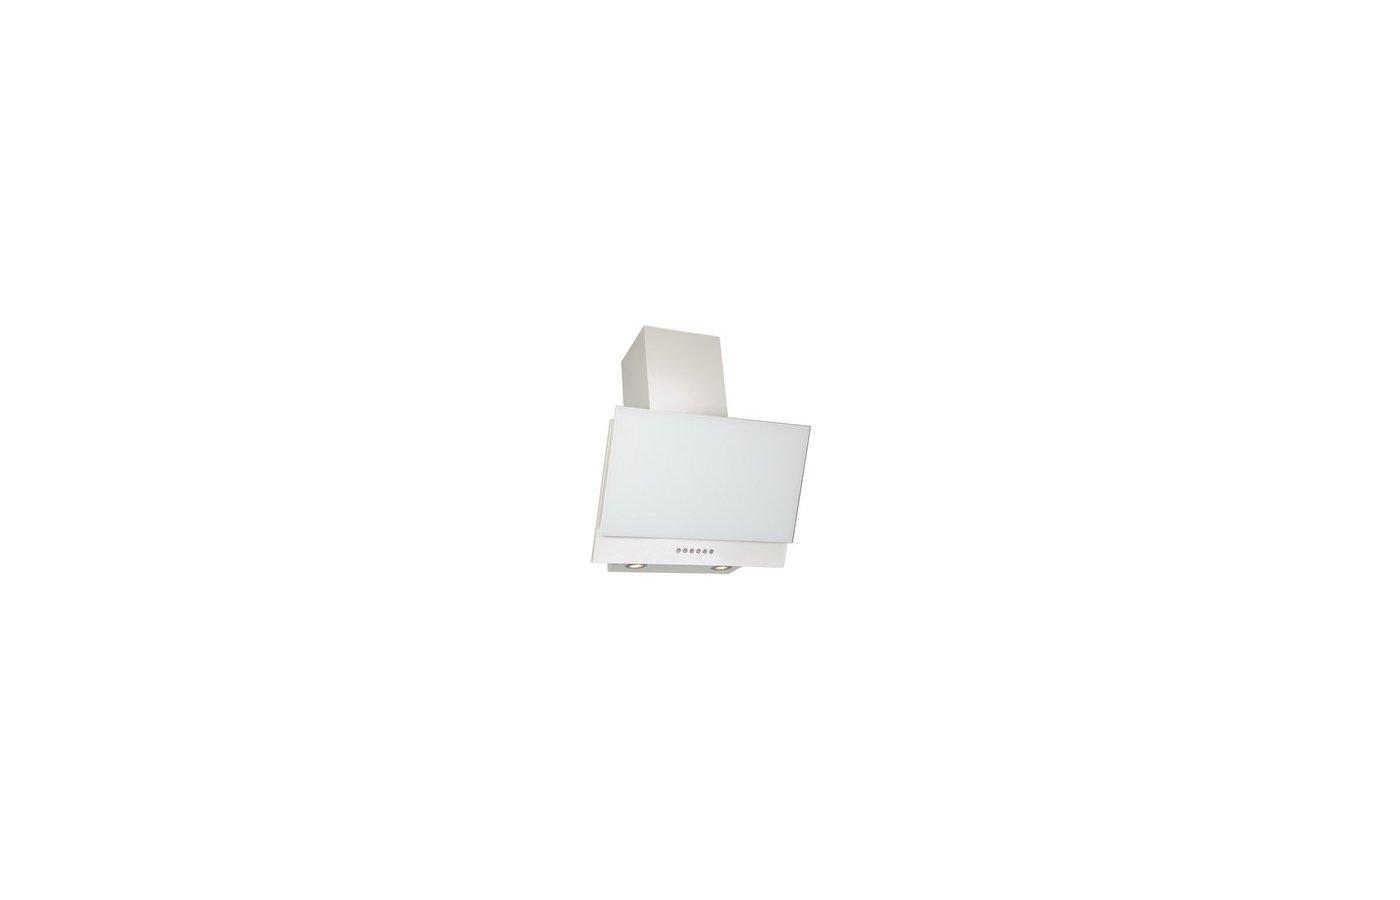 Вытяжка ELIKOR Рубин S4 50П-700-Э4Г перламутр/белый